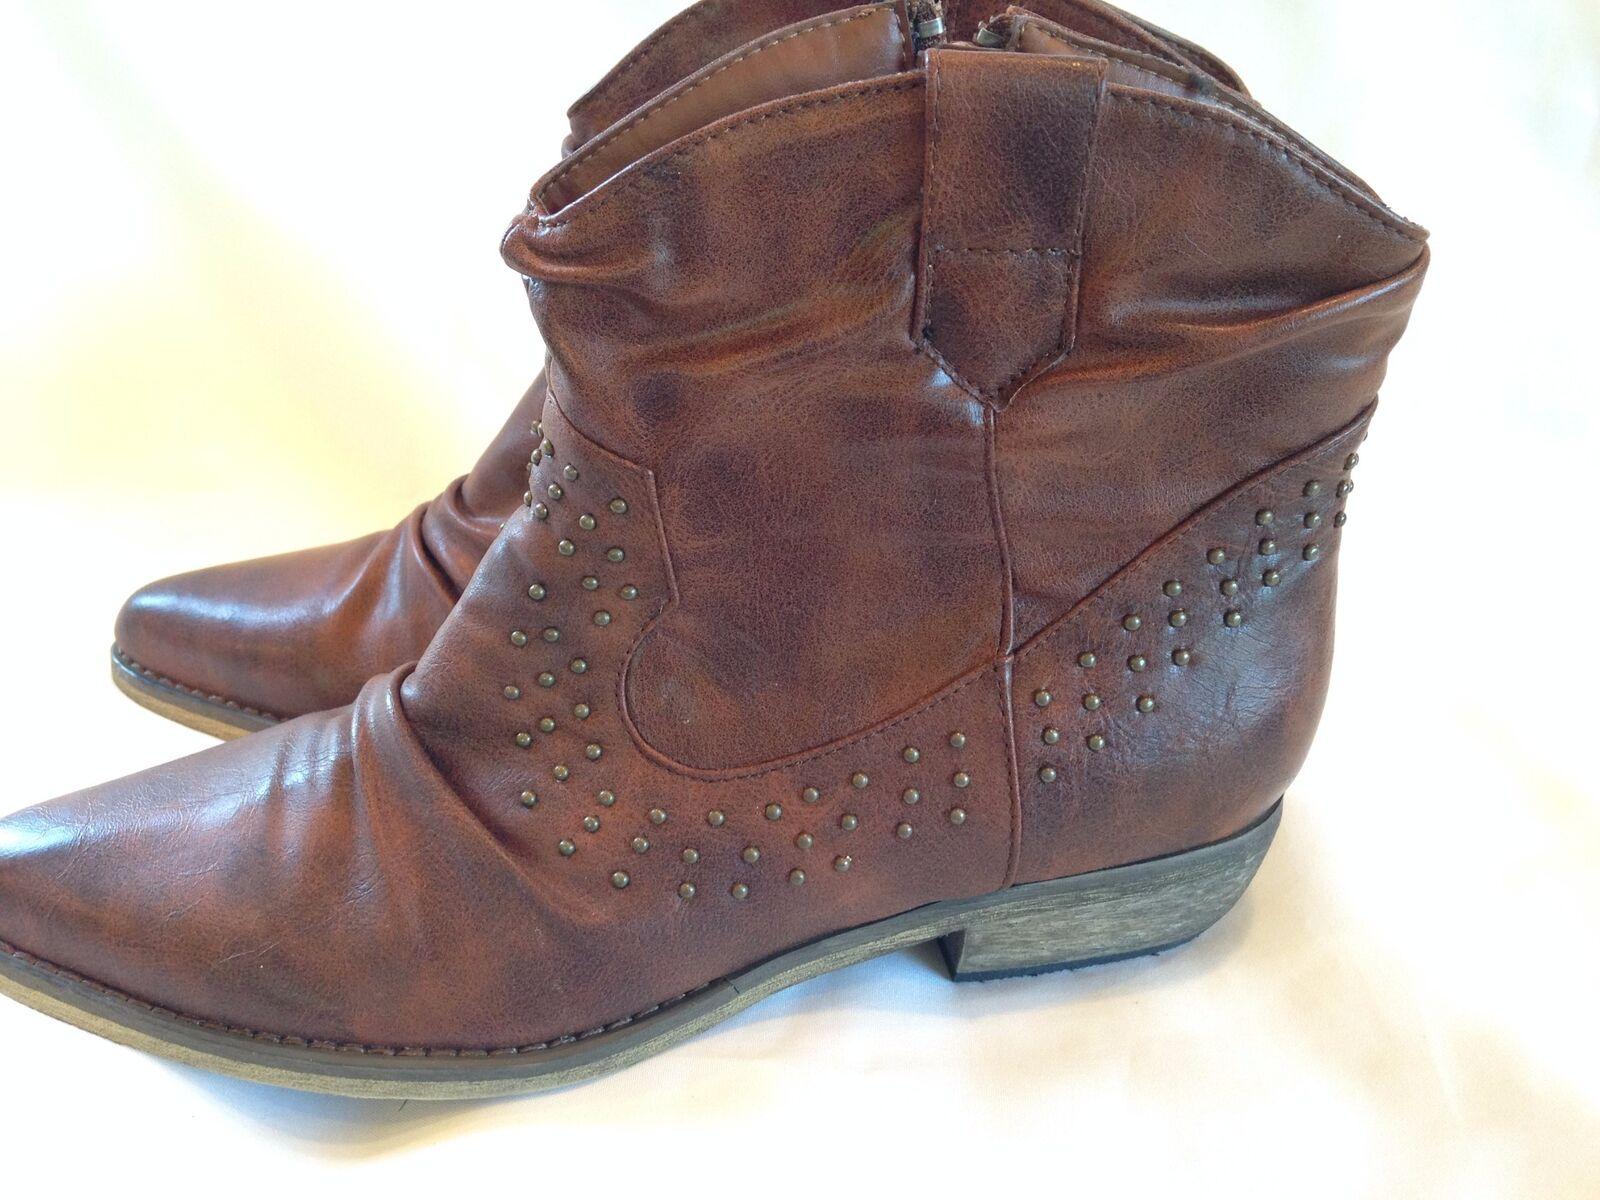 Bucco Capensis Verbane Womens Ankle Boot Cognac Size 9 Retail 0